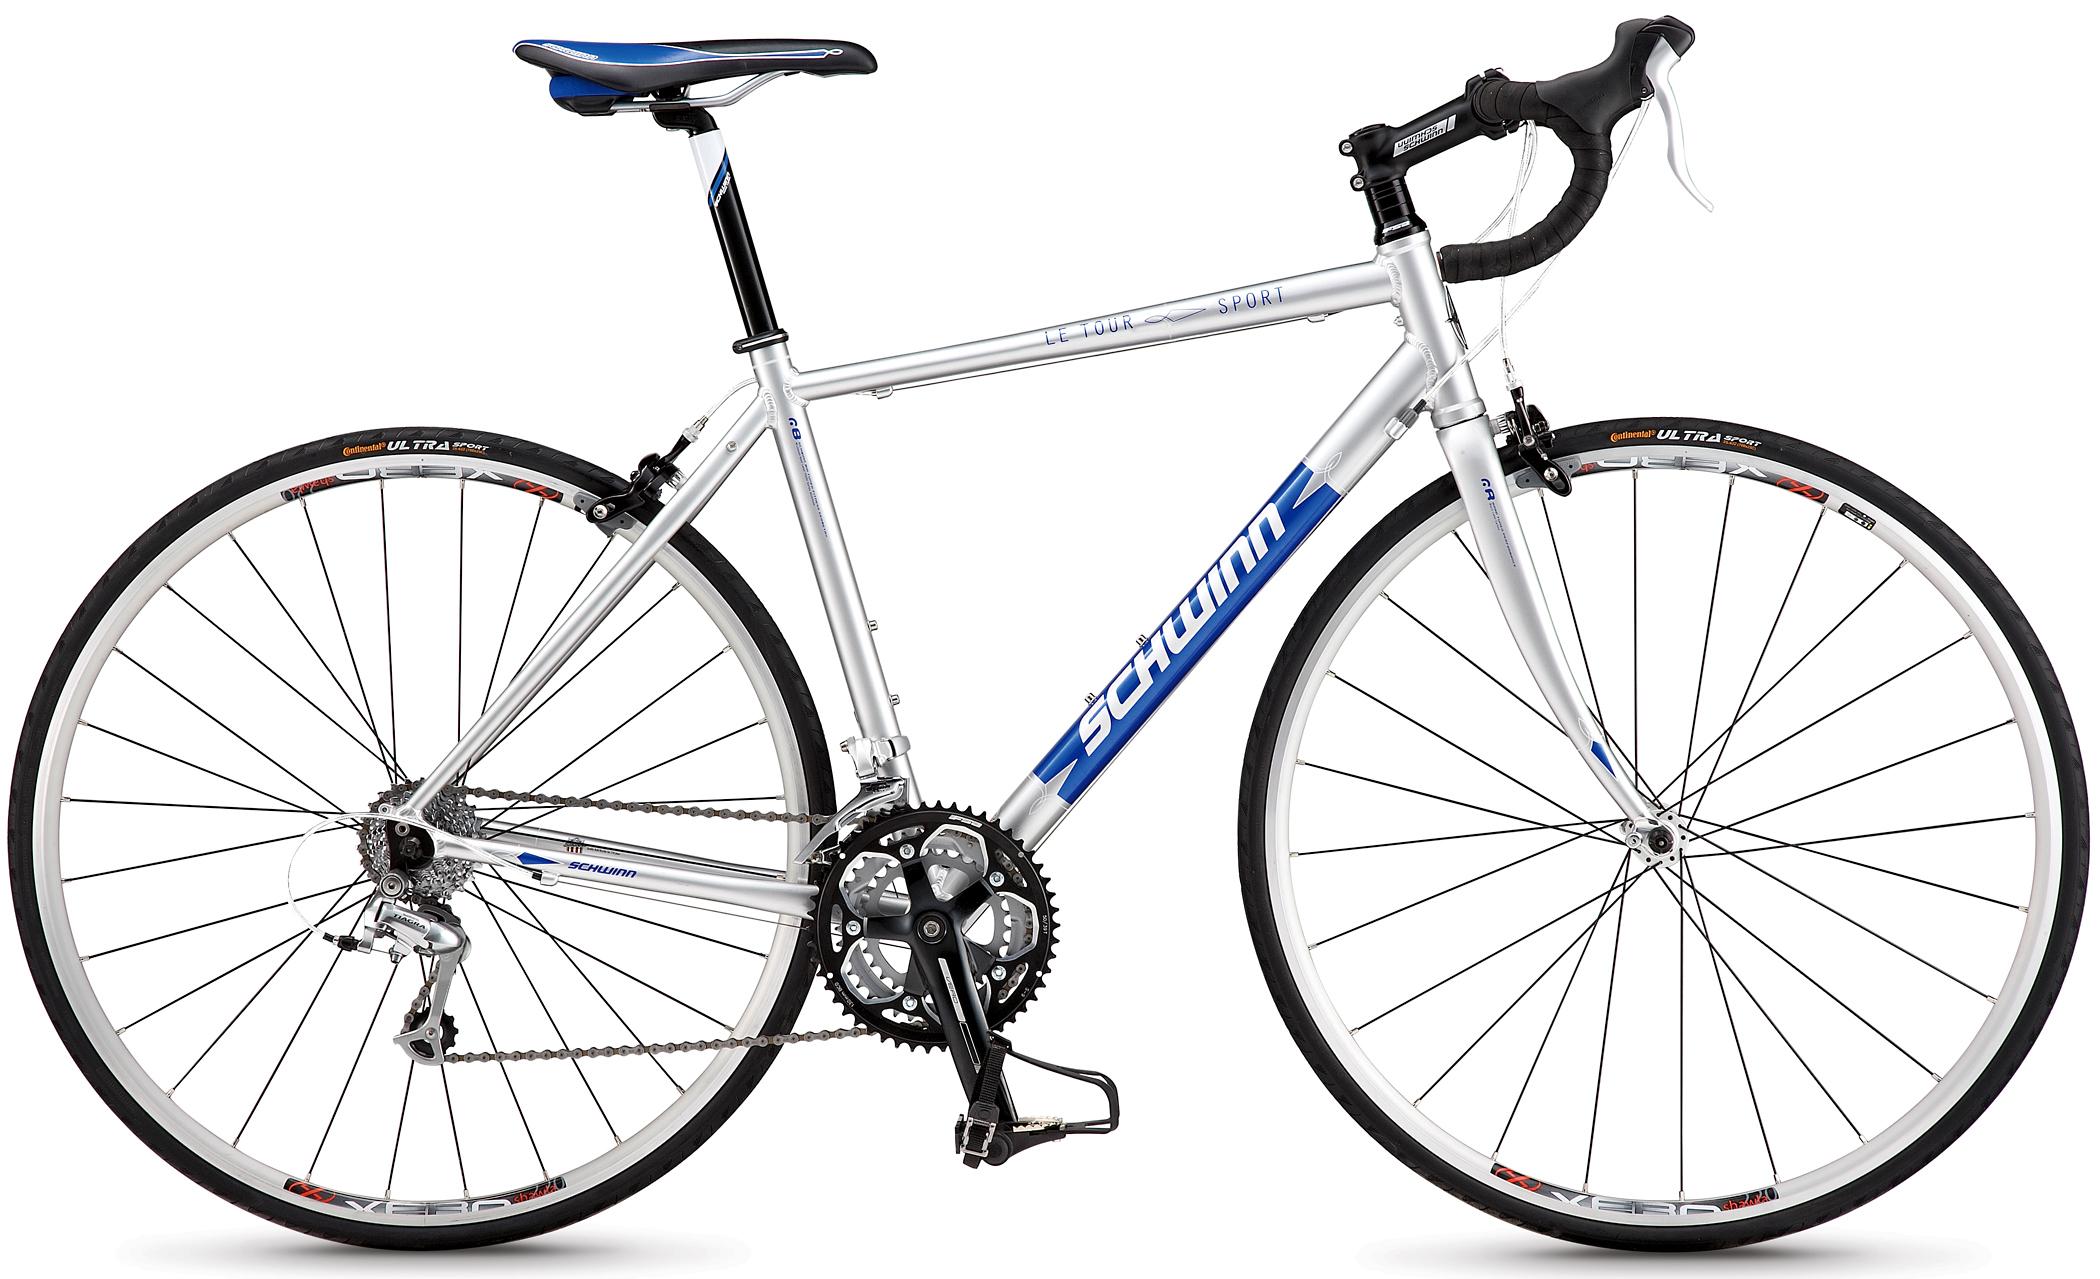 Schwinn Road Bikes Le Tour Super Reynolds 520 Chromoly